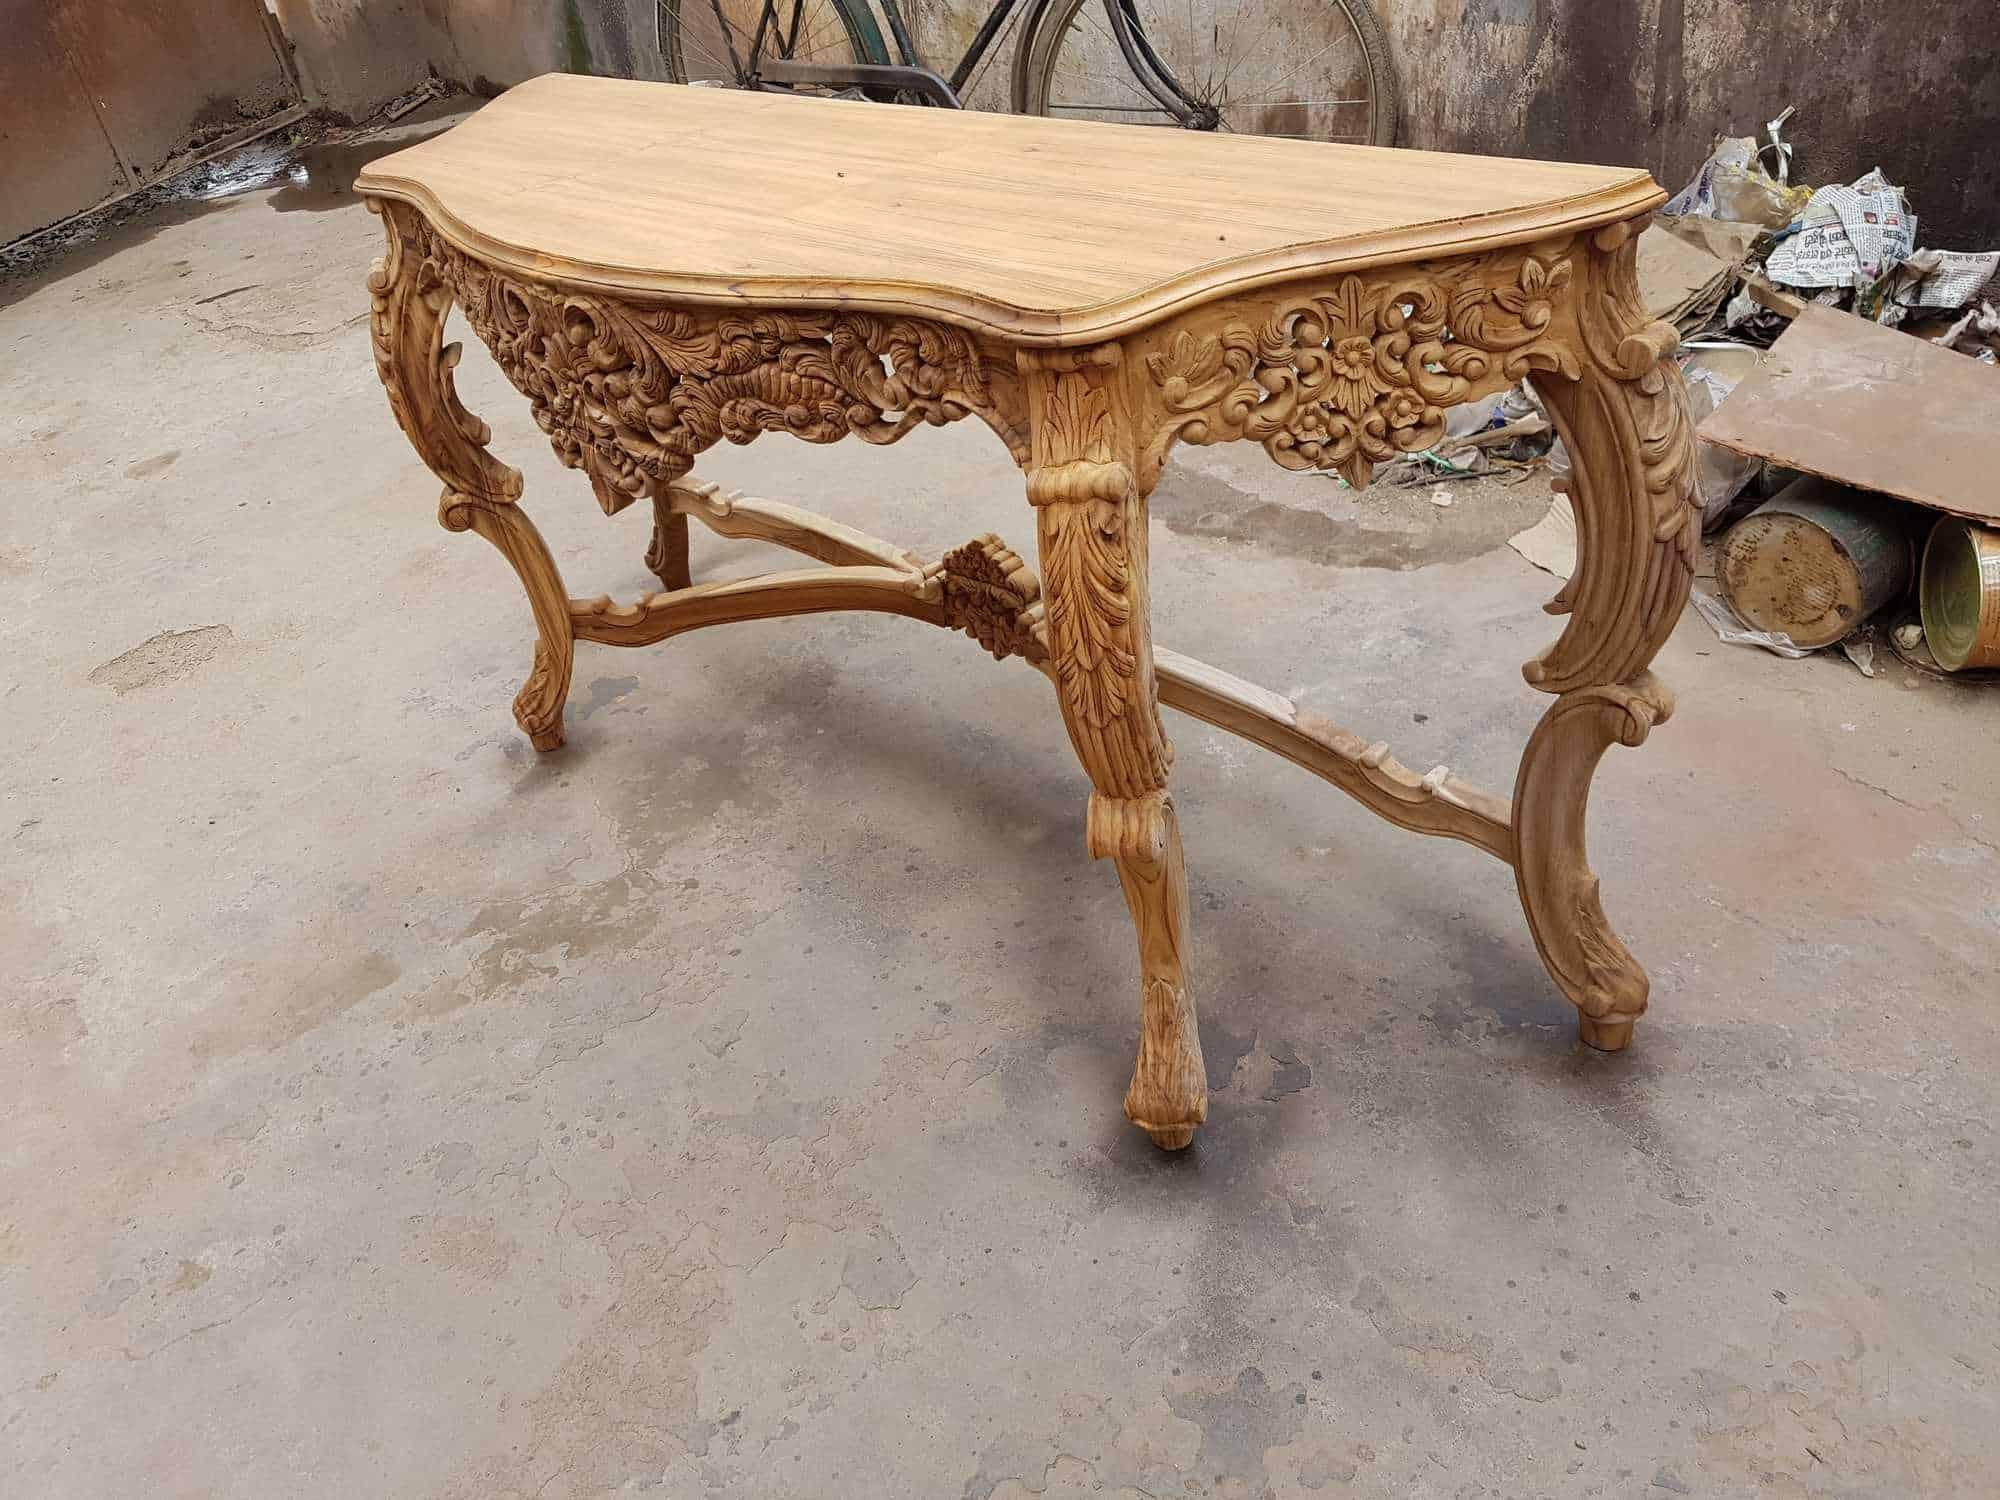 Ghar Furniture Pandri Furniture Dealers In Raipur Chhattisgarh